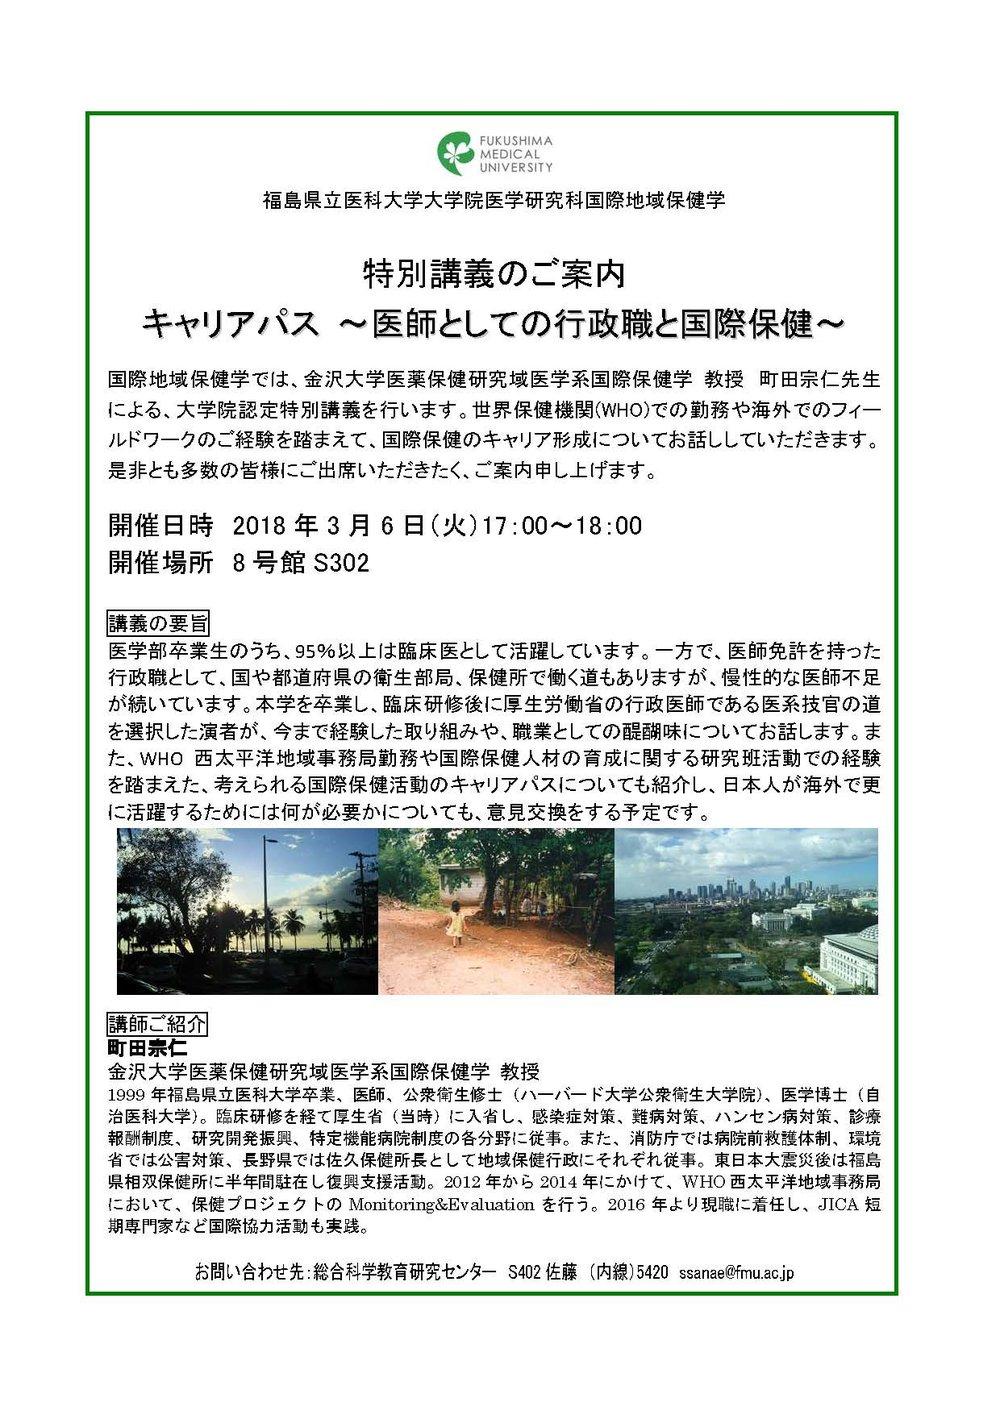 町田先生 poster_20181220_image.jpg